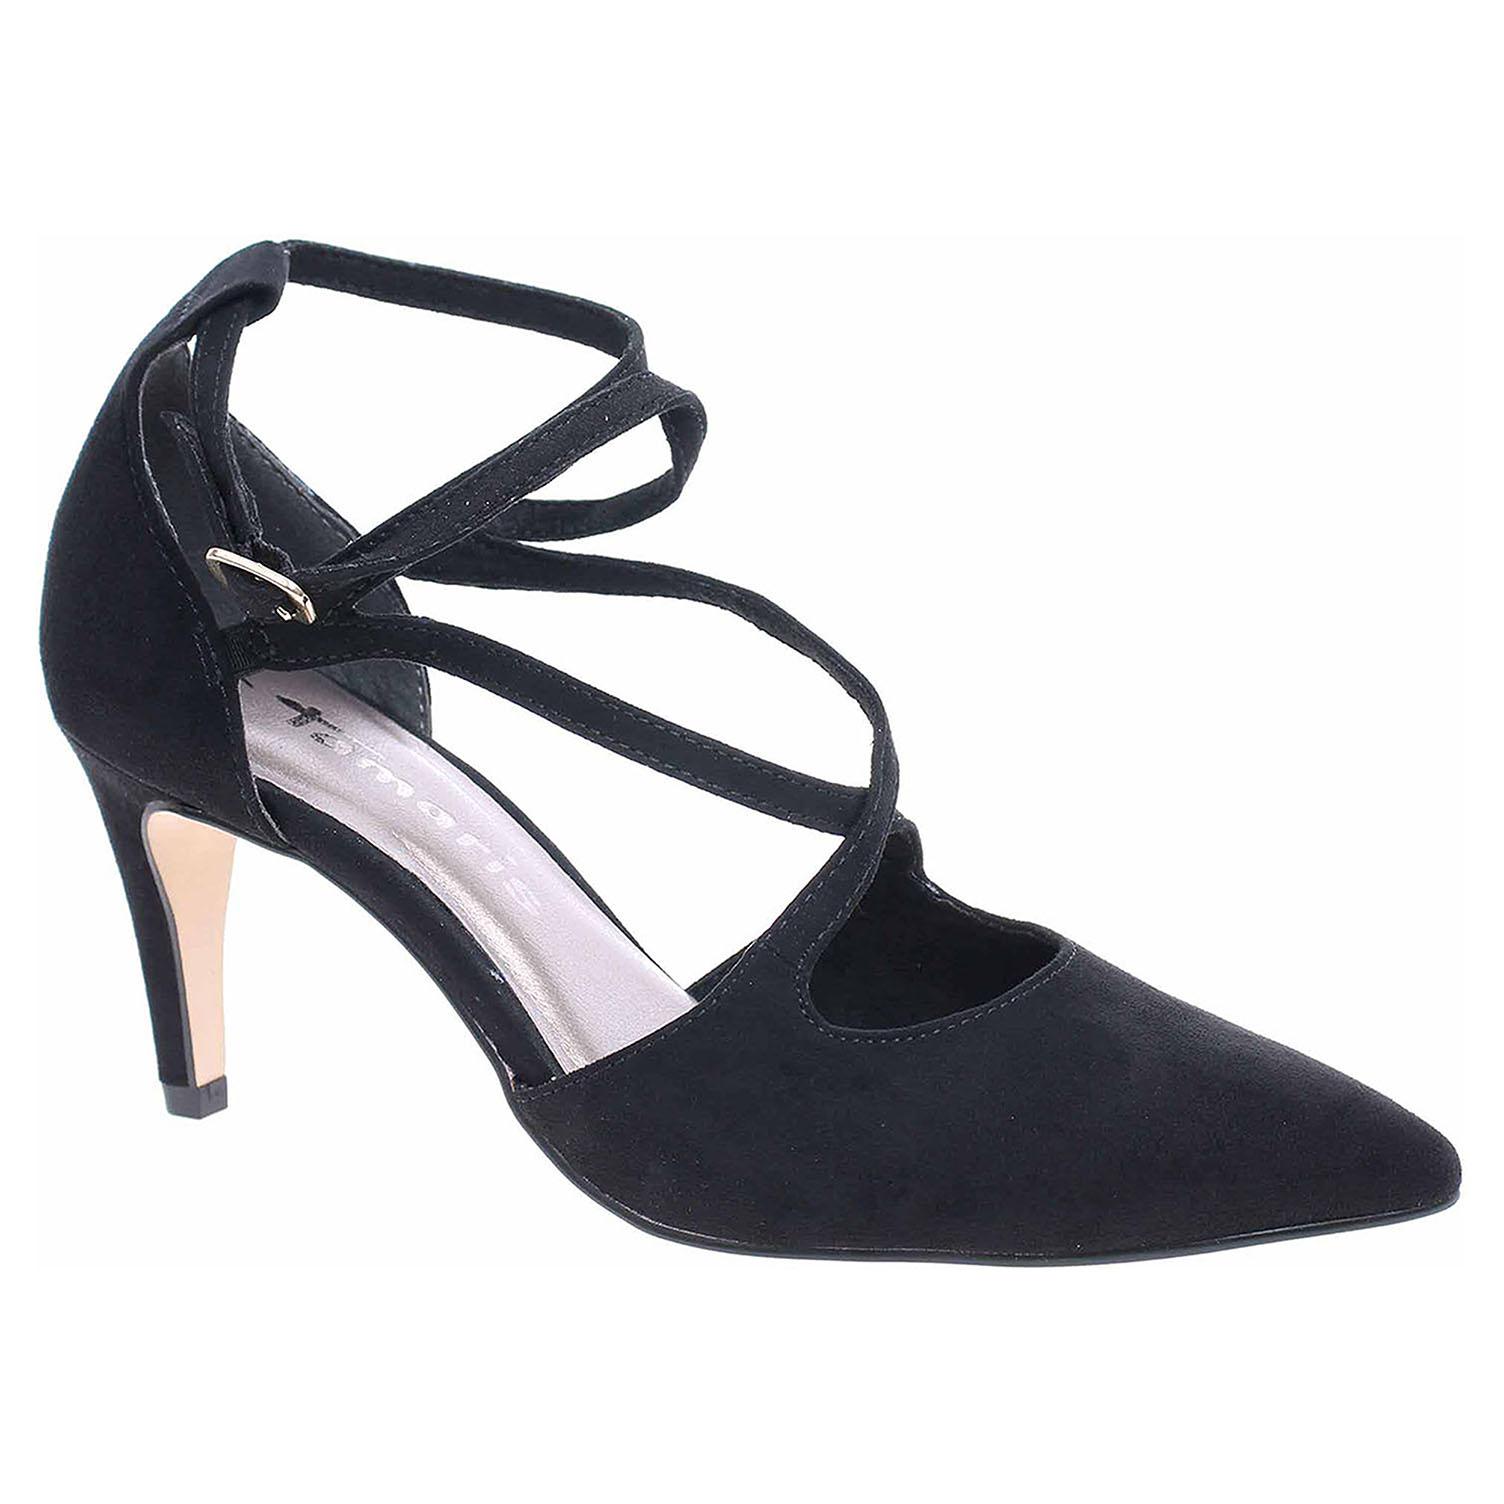 d03957c9b154 Ecco Dámská společenská obuv Tamaris 1-24440-22 black 22901437